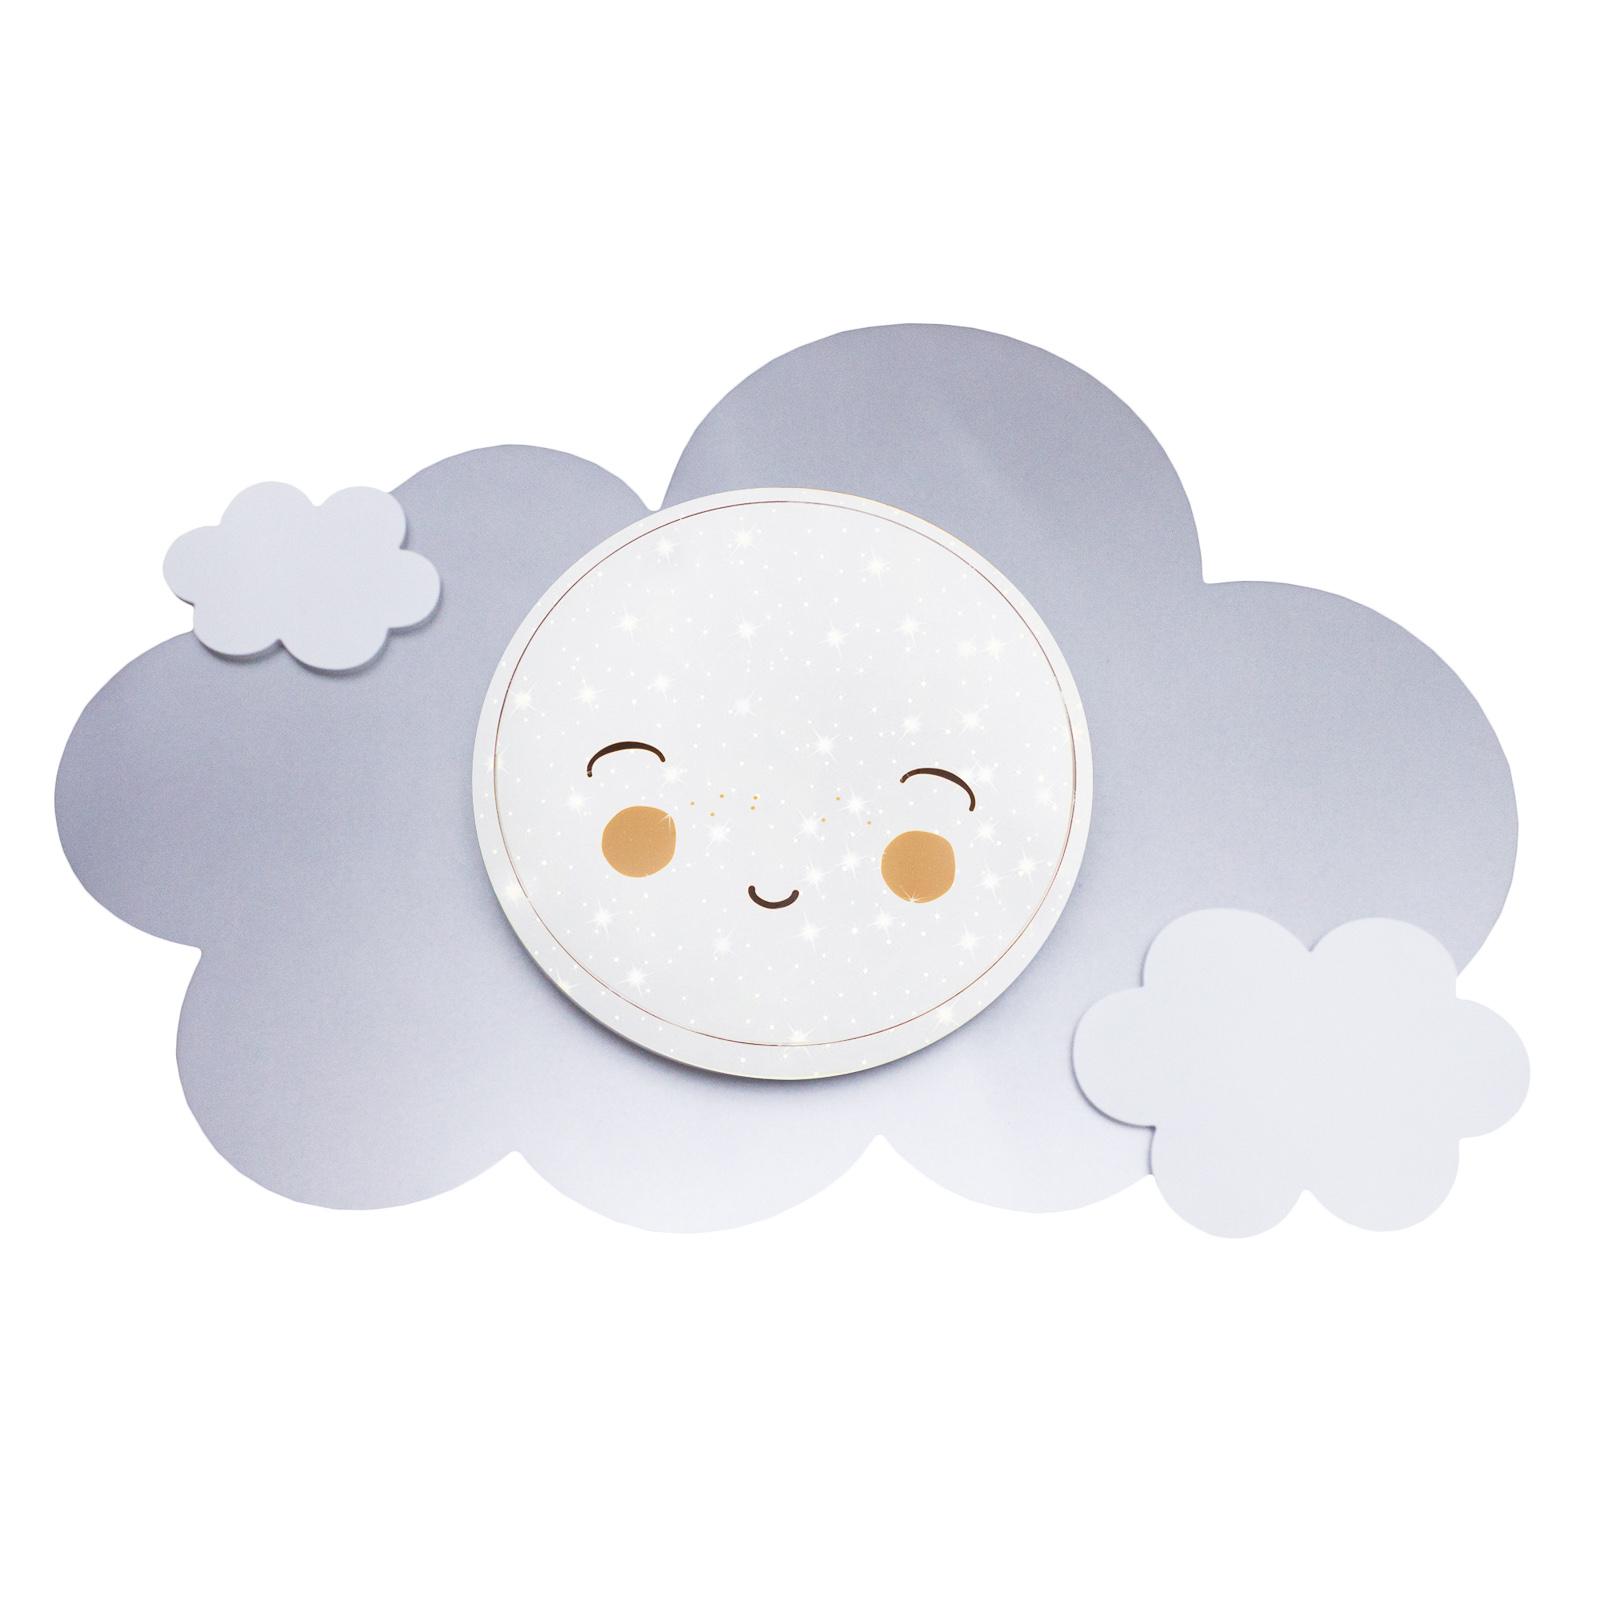 Kinkiet LED Bildwolke Starlight Smile srebrny